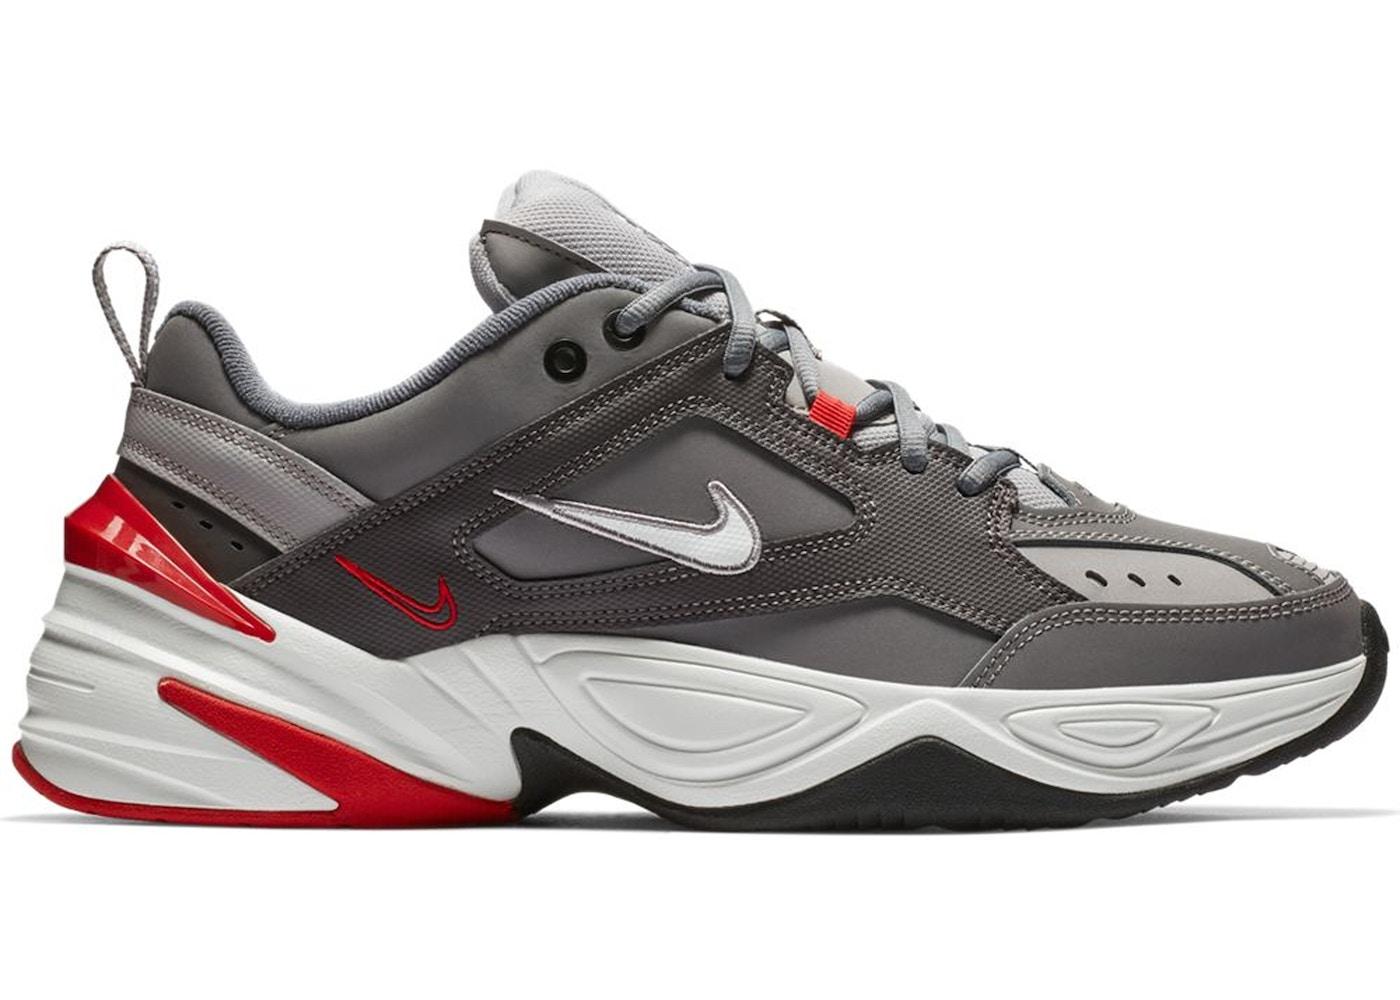 quality design afe53 e942a Nike M2K Tekno Gunsmoke University Red